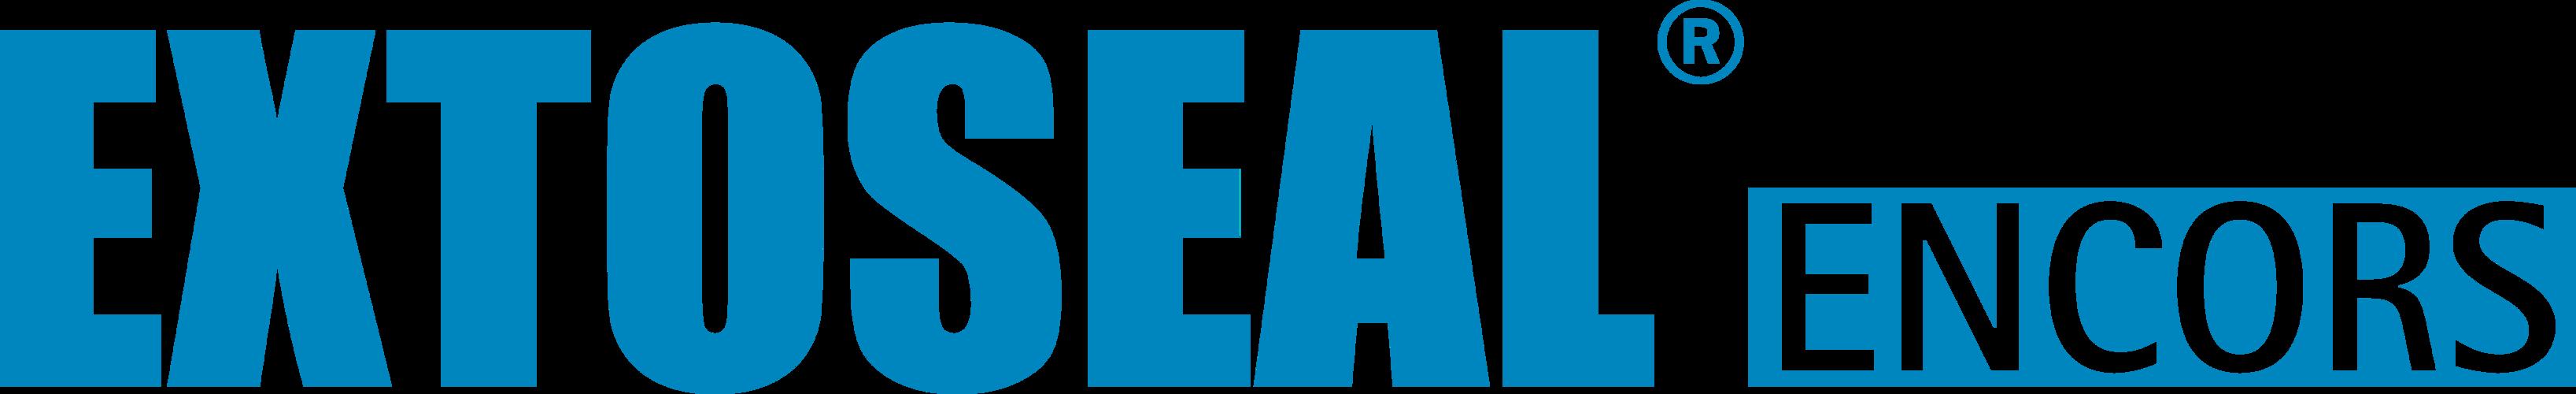 EXTOSEAL ENCORS